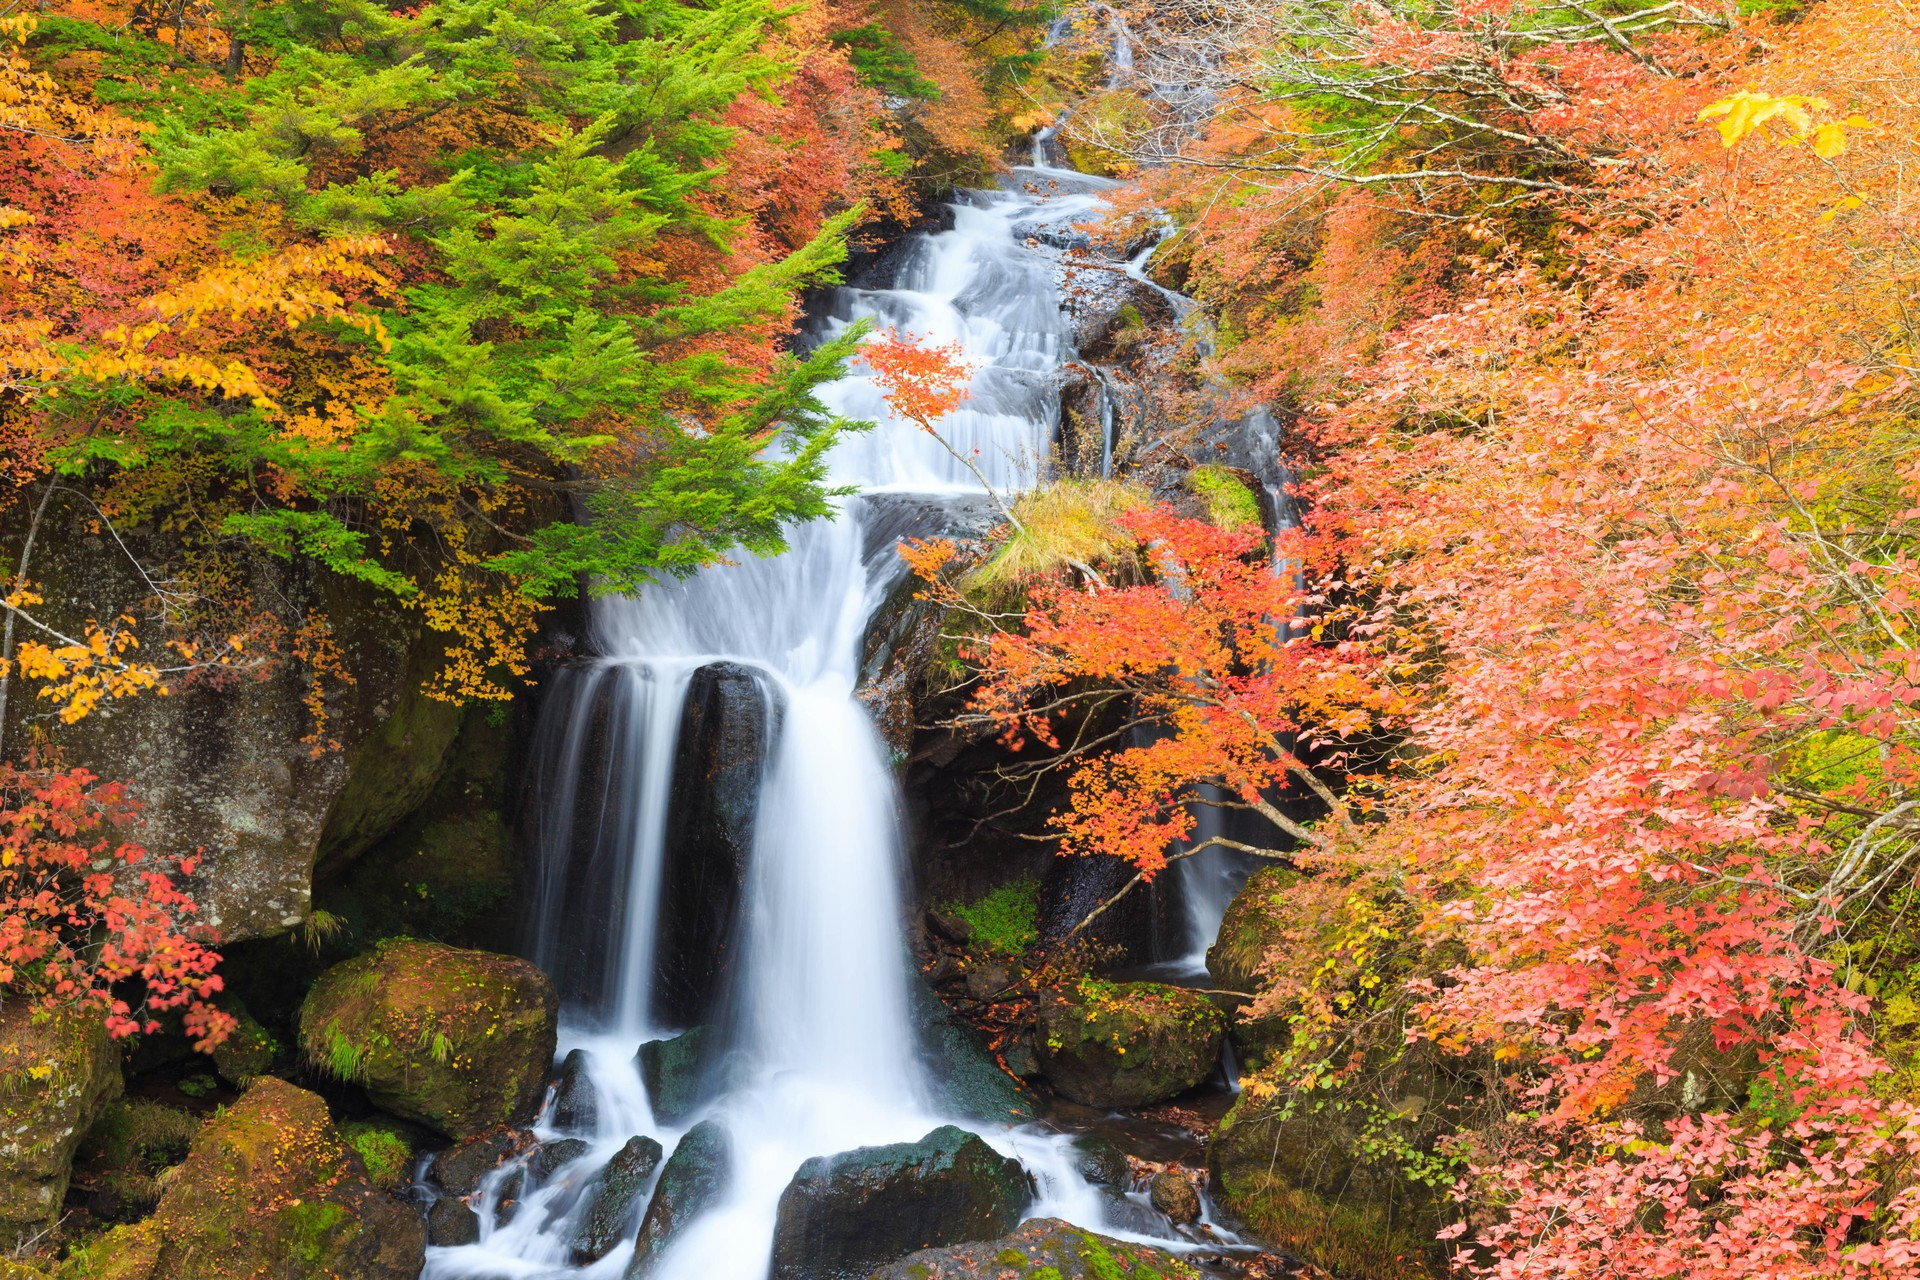 Autumn in rural Japan